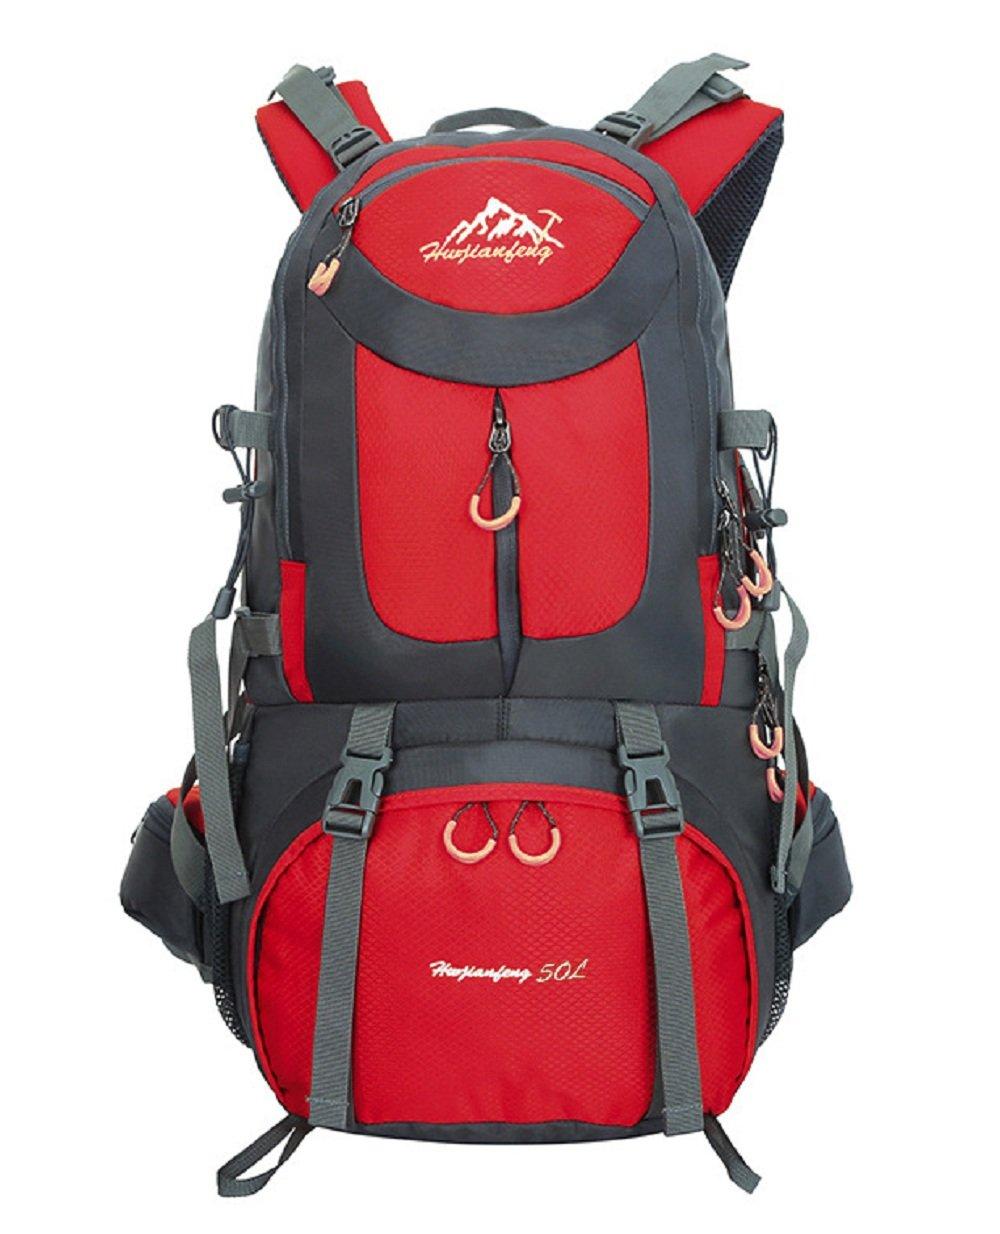 Fanci Waterproof Lightweight Travel Hiking Backpack Daypack for Women Men Camping Trekking Backpack